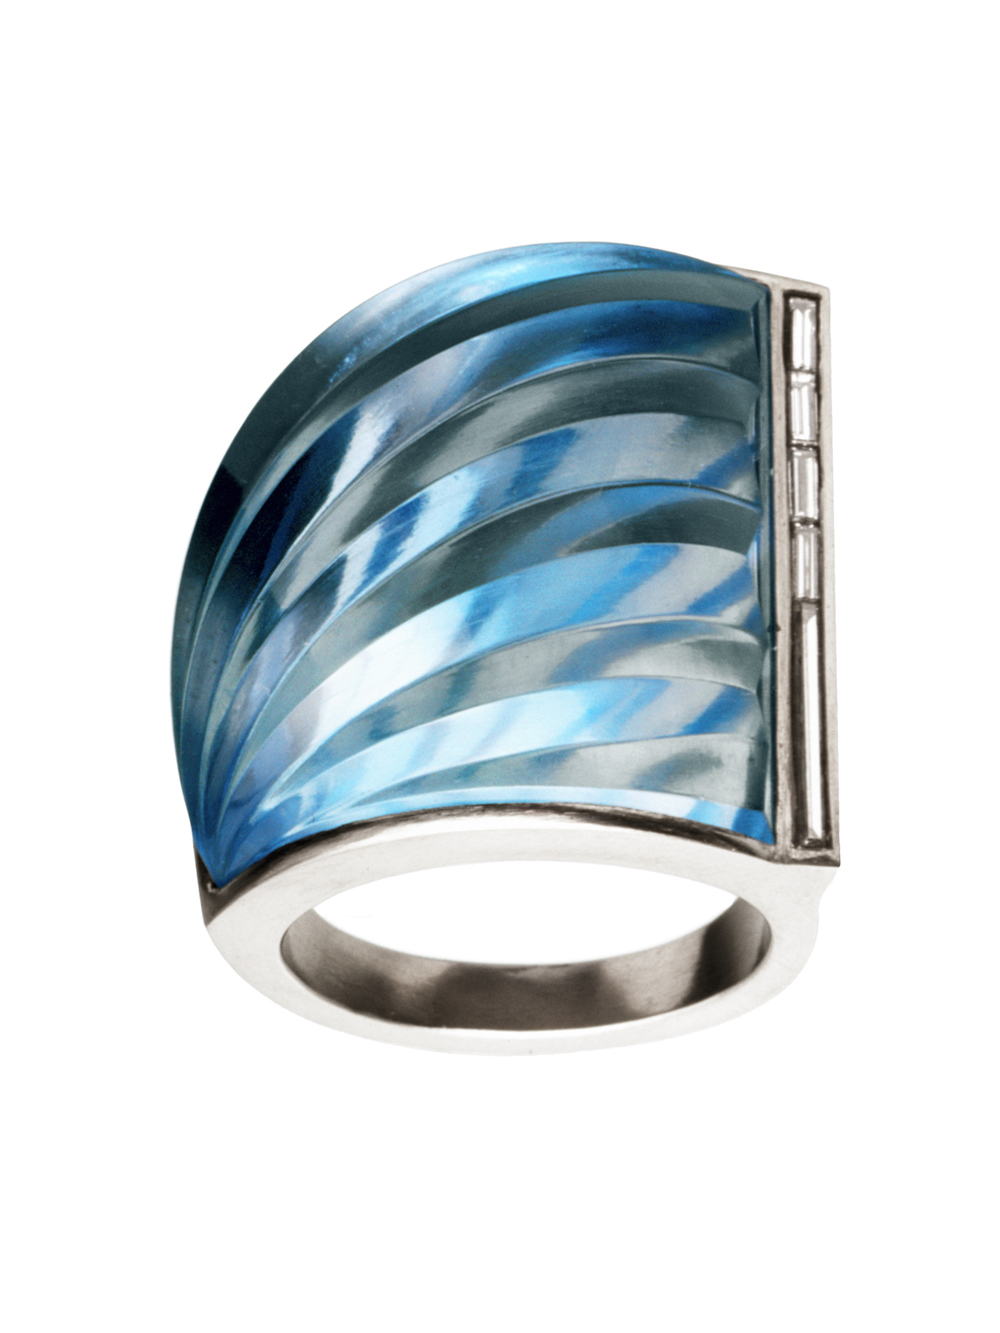 Frances's Ring 2006